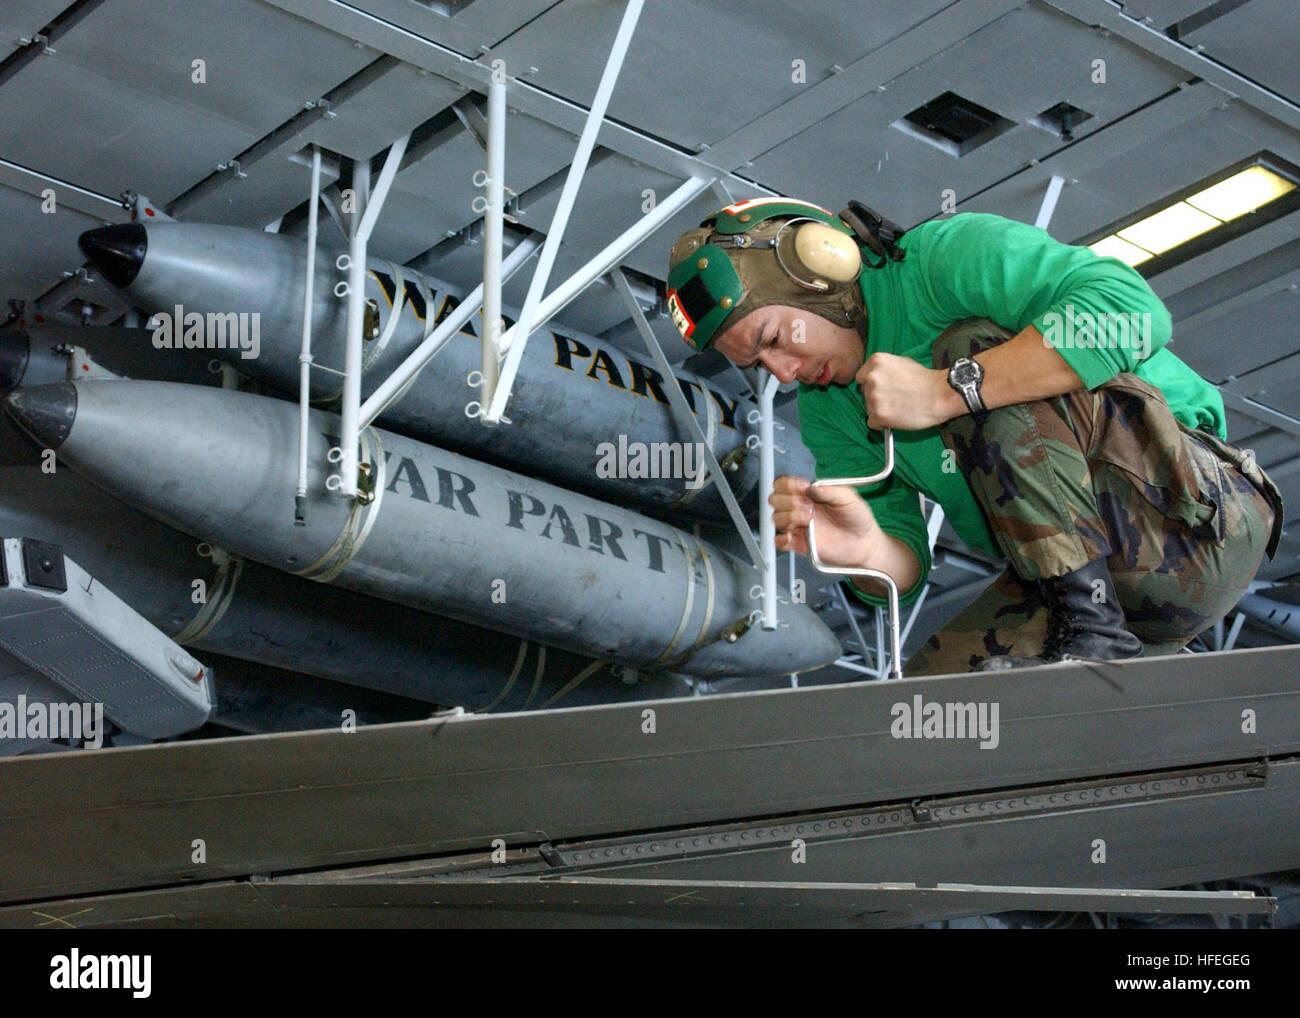 030312-N-4965F-501 Mare Mediterraneo (Mar. 12, 2003) -- Aviazione meccanico strutturale di seconda classe Kenn pareti Immagini Stock